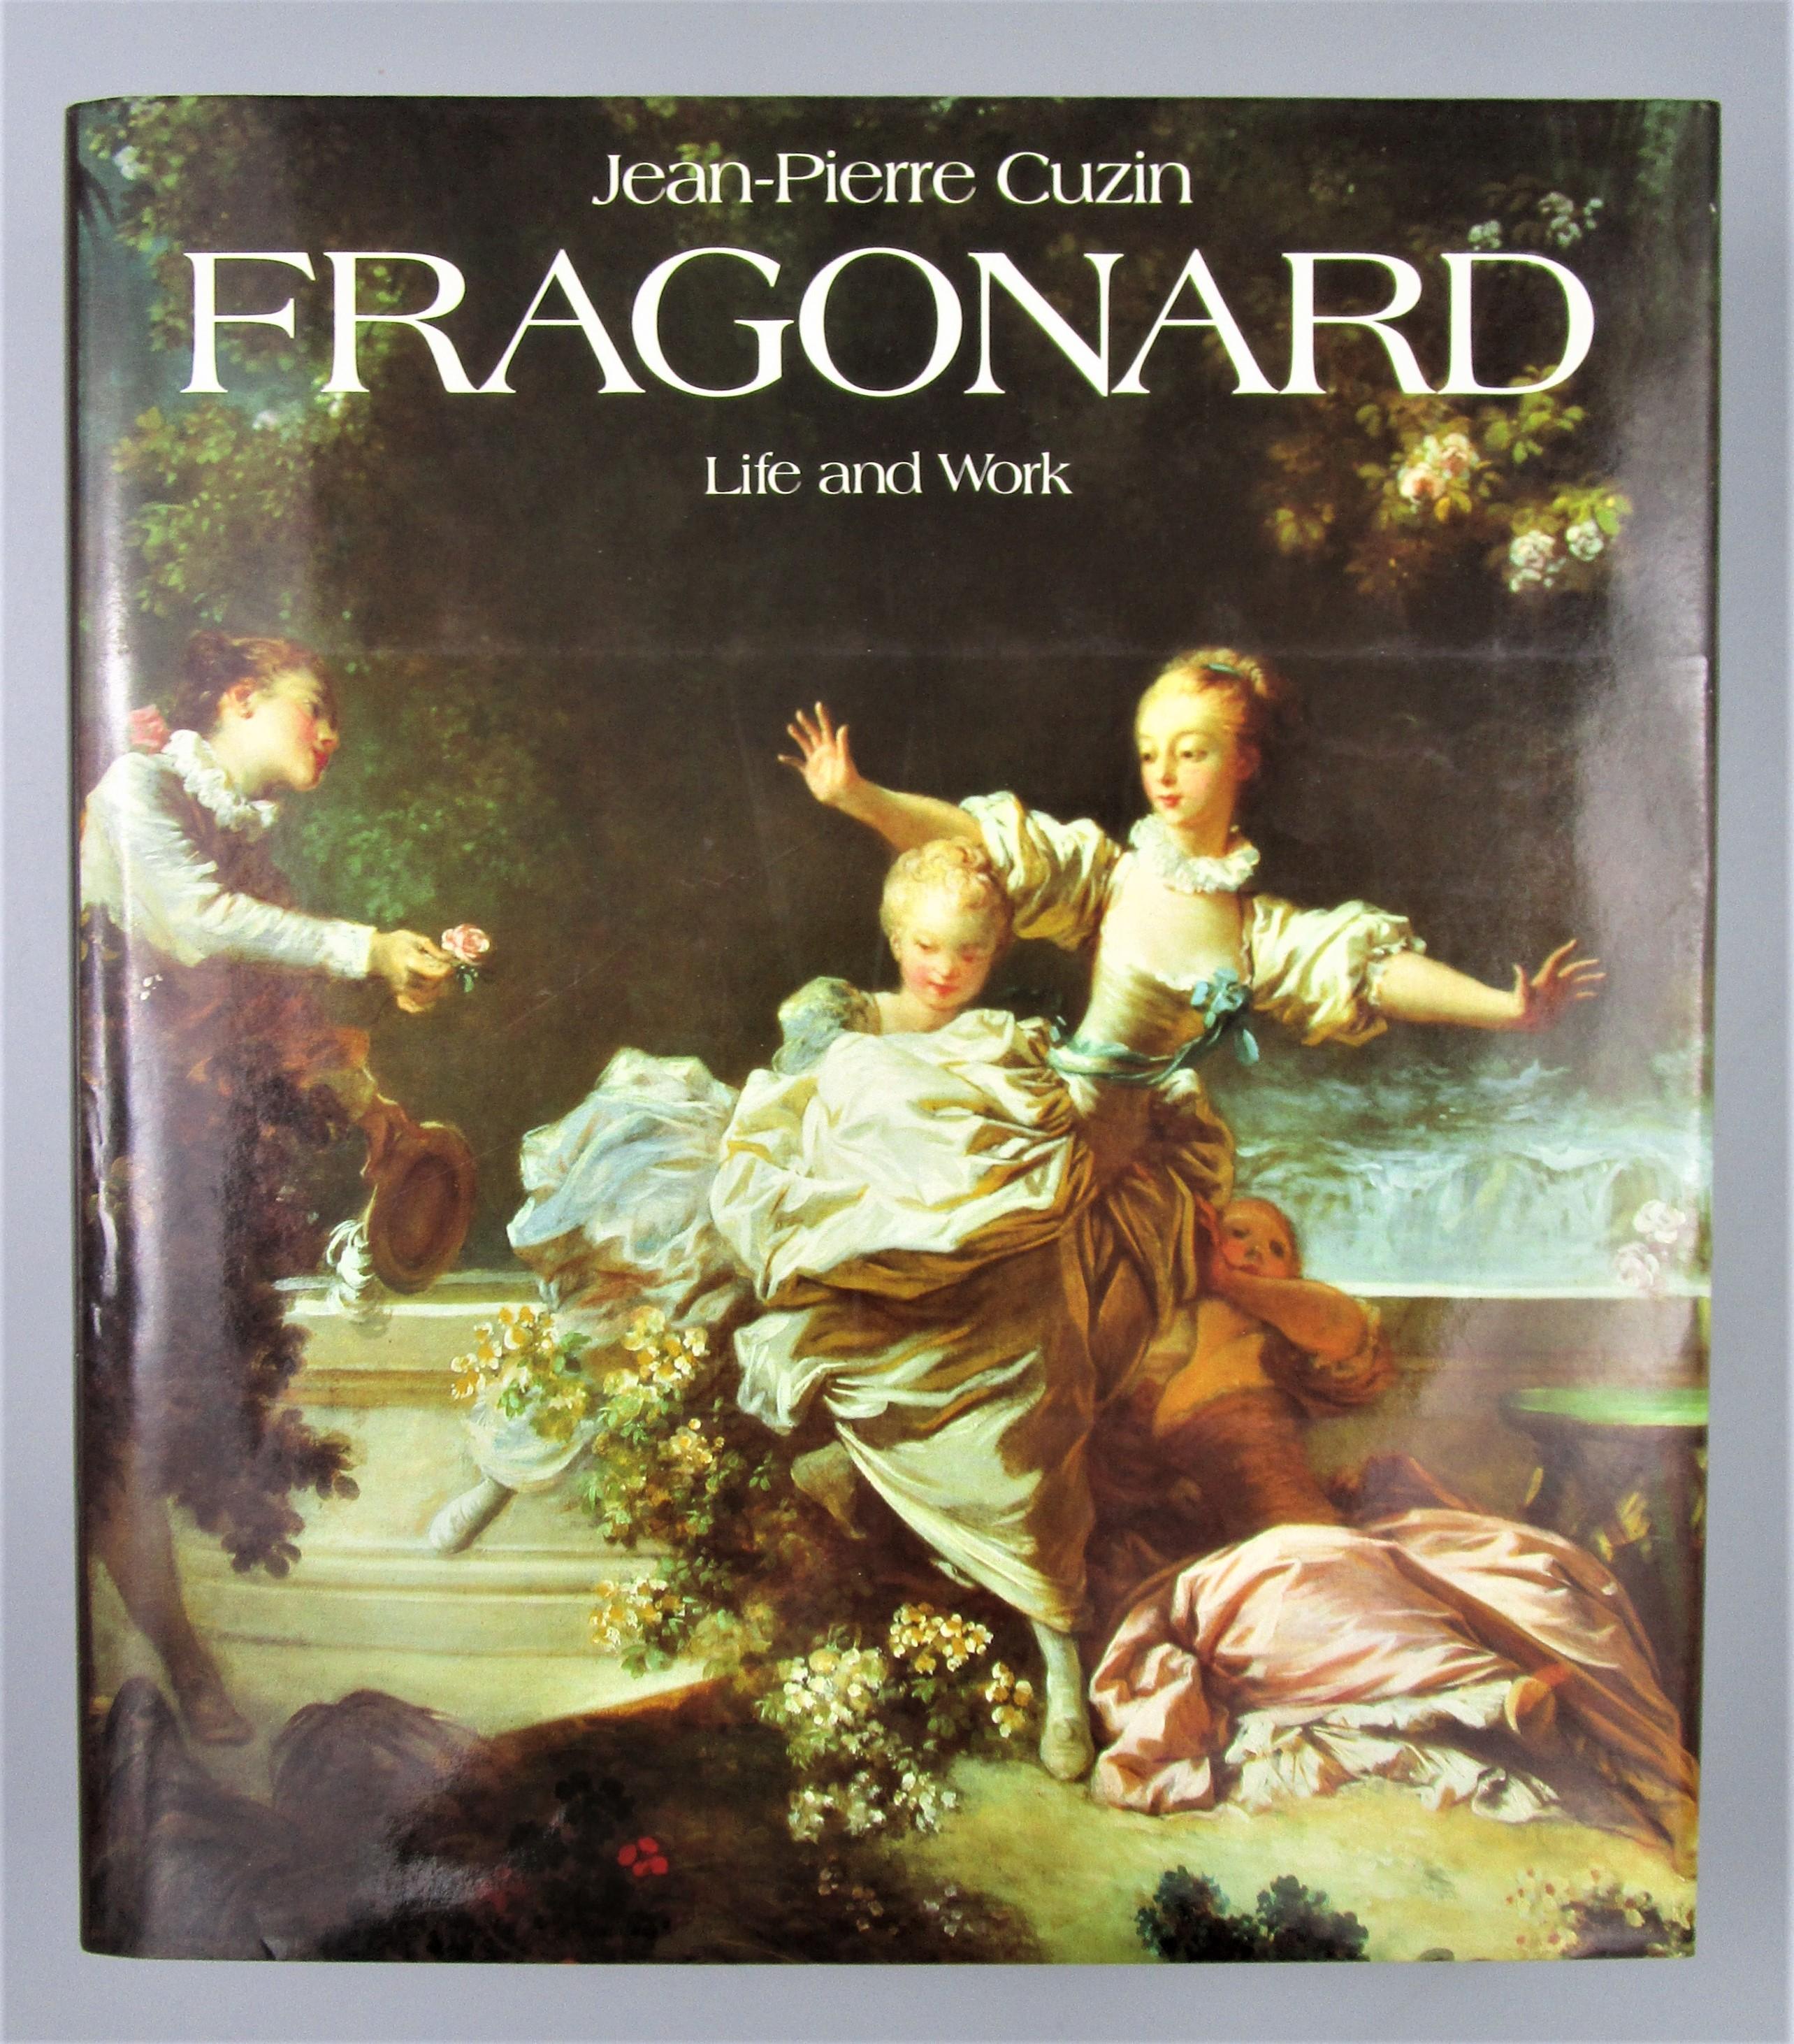 FRAGONARD: LIFE AND WORK, by Jean-Piere Cuzin - 1988